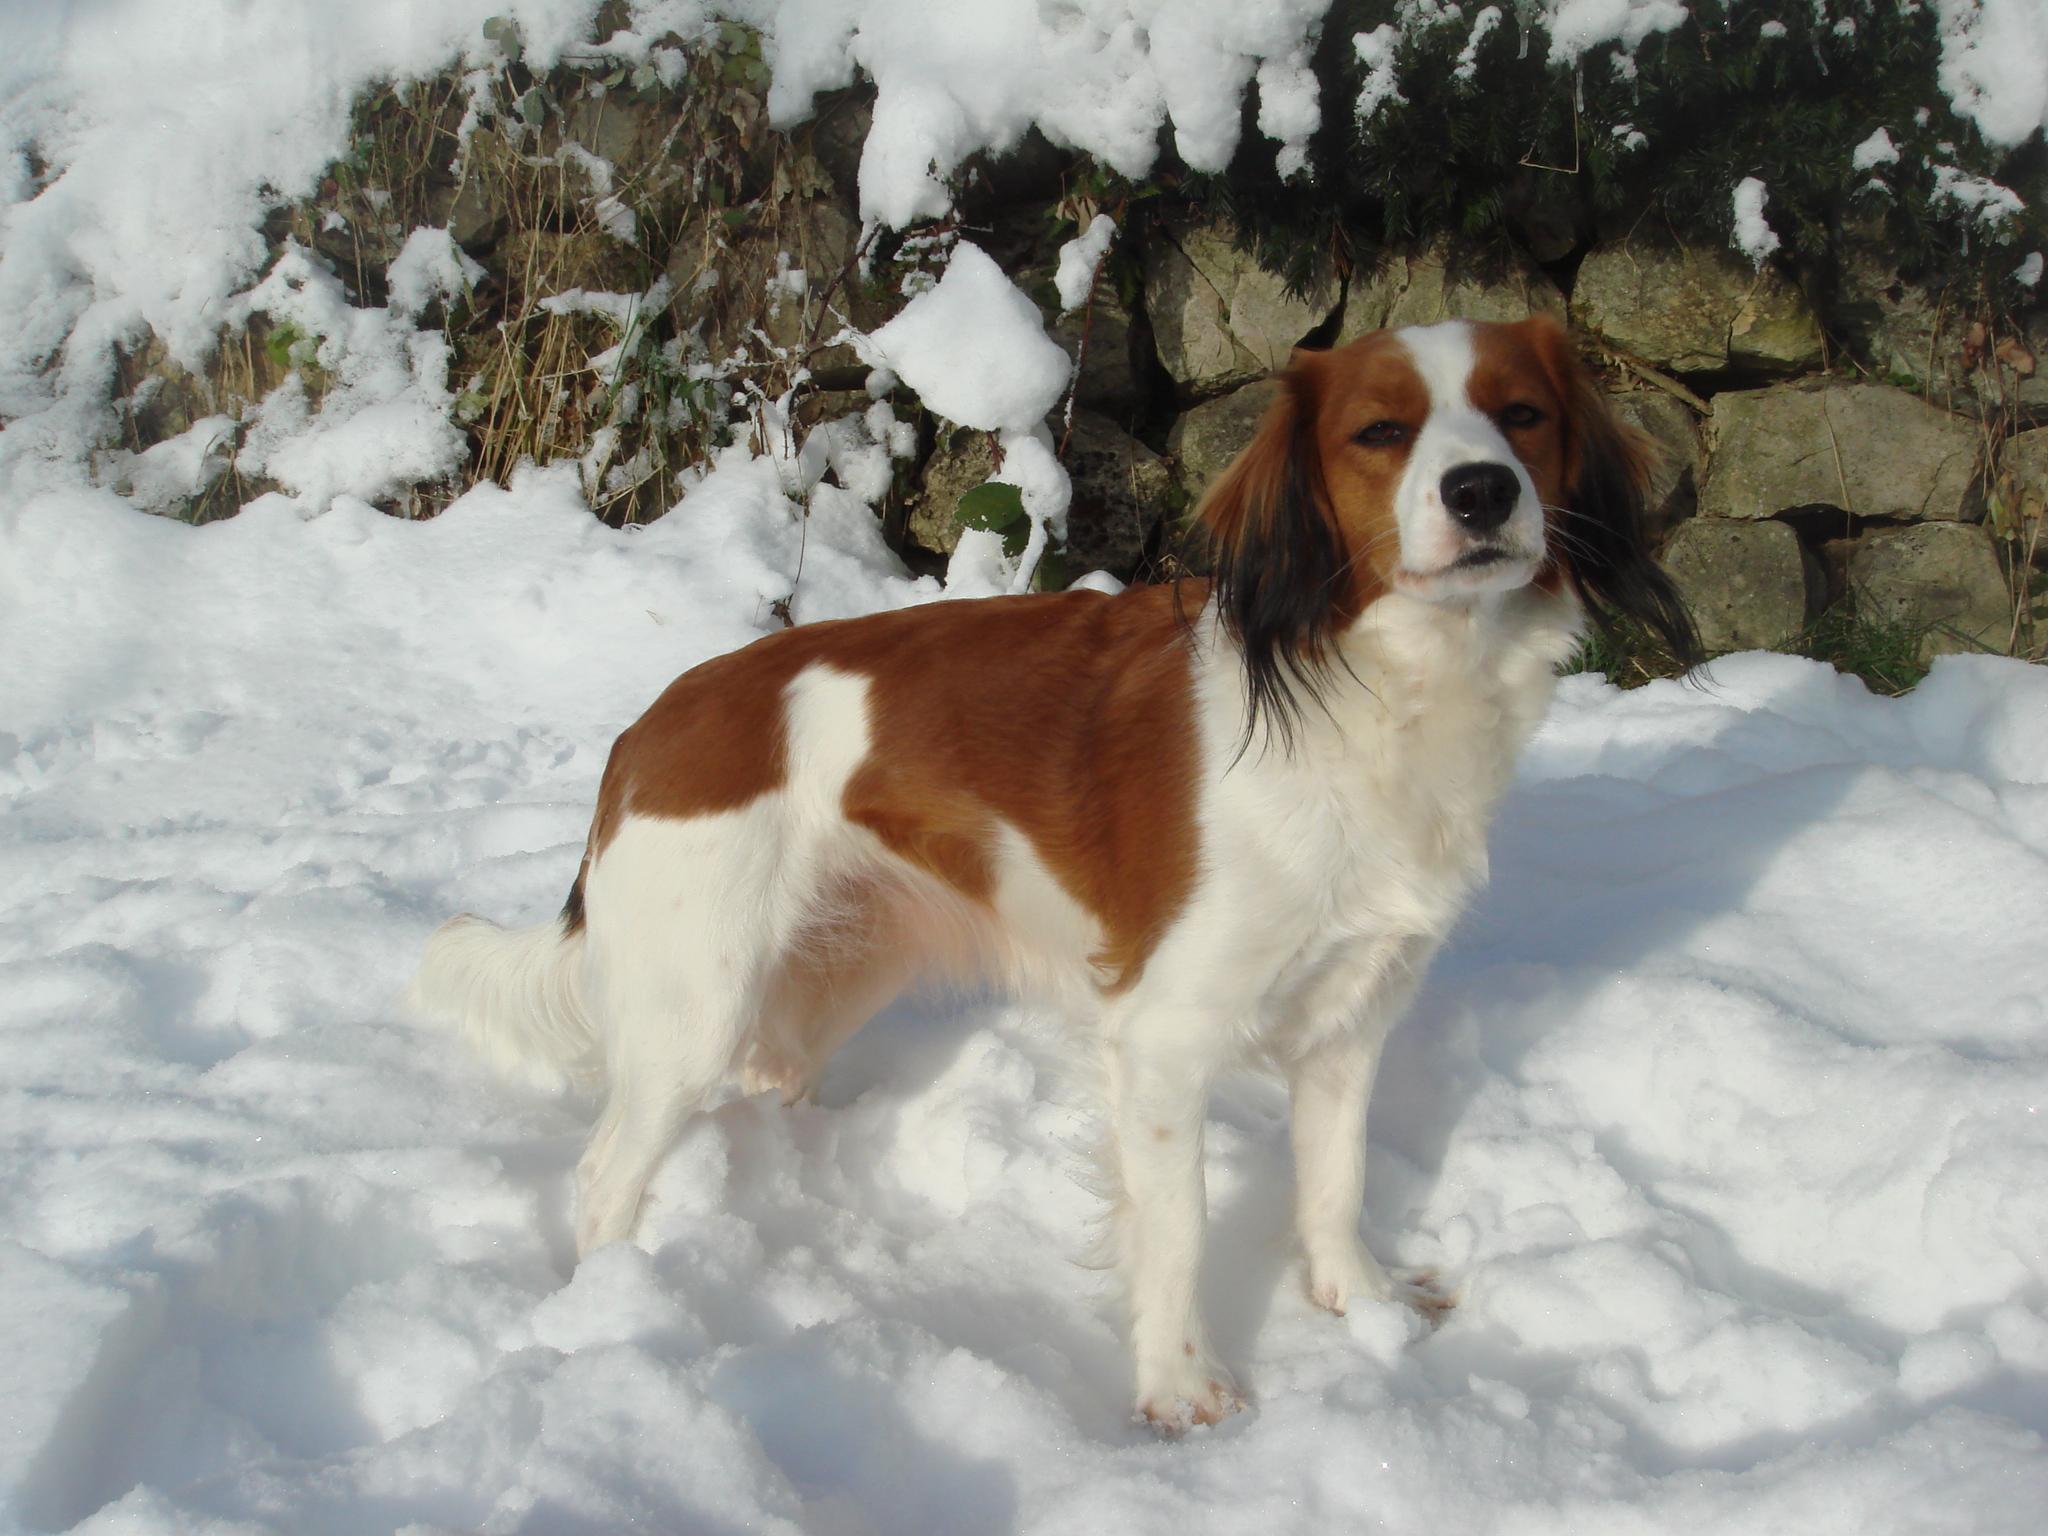 Winter Kooikerhondje Dog Wallpaper 2048×1536 #195657 HD Wallpaper Res ...